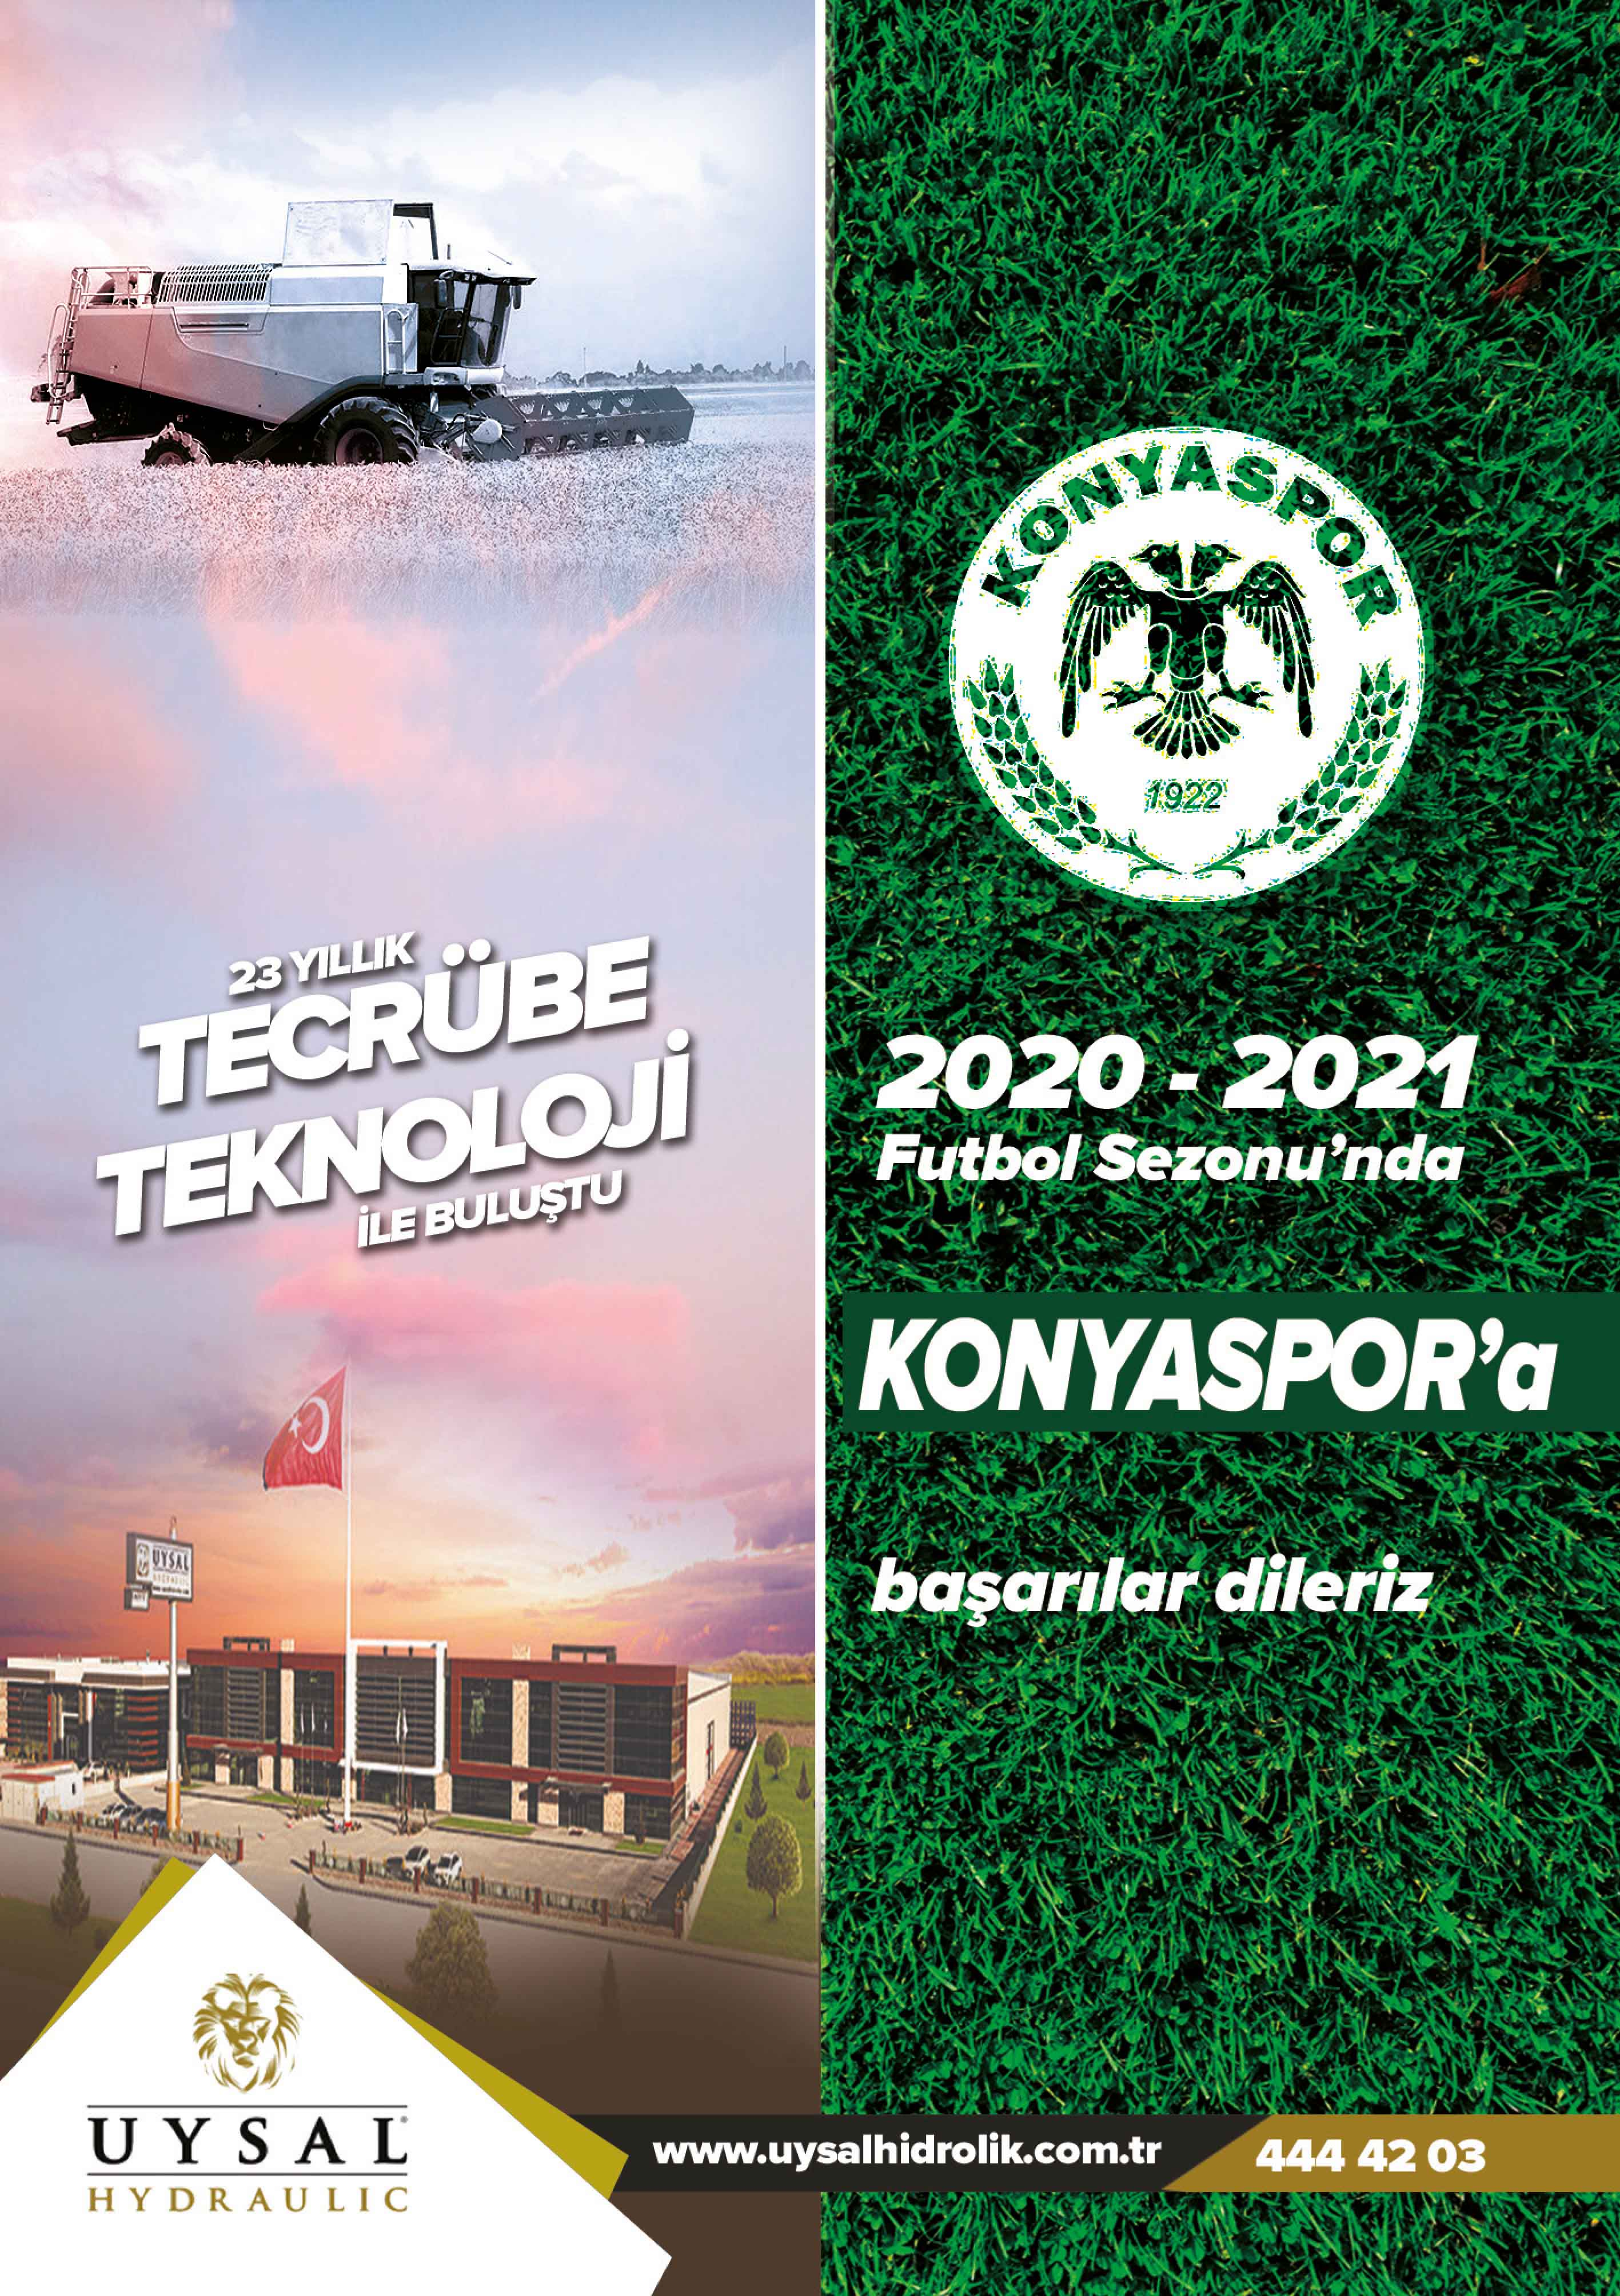 ih-konyaspor-2020-2021-fiksturu-029.jpg